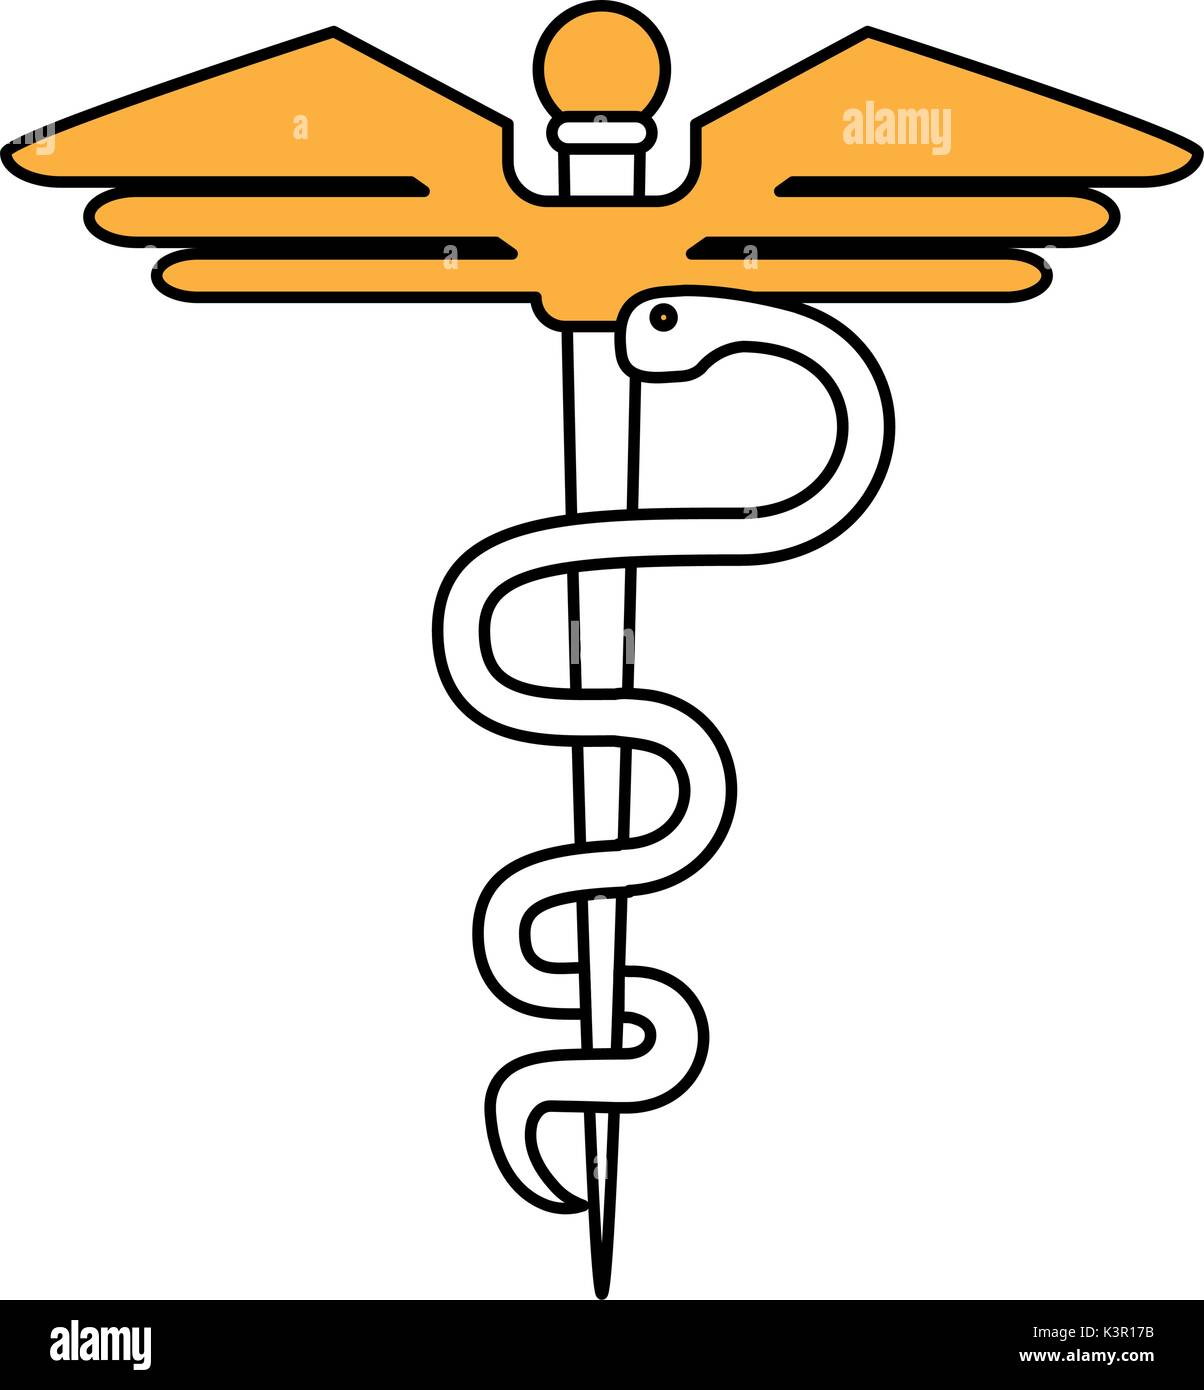 Isolated caduceus design - Stock Image